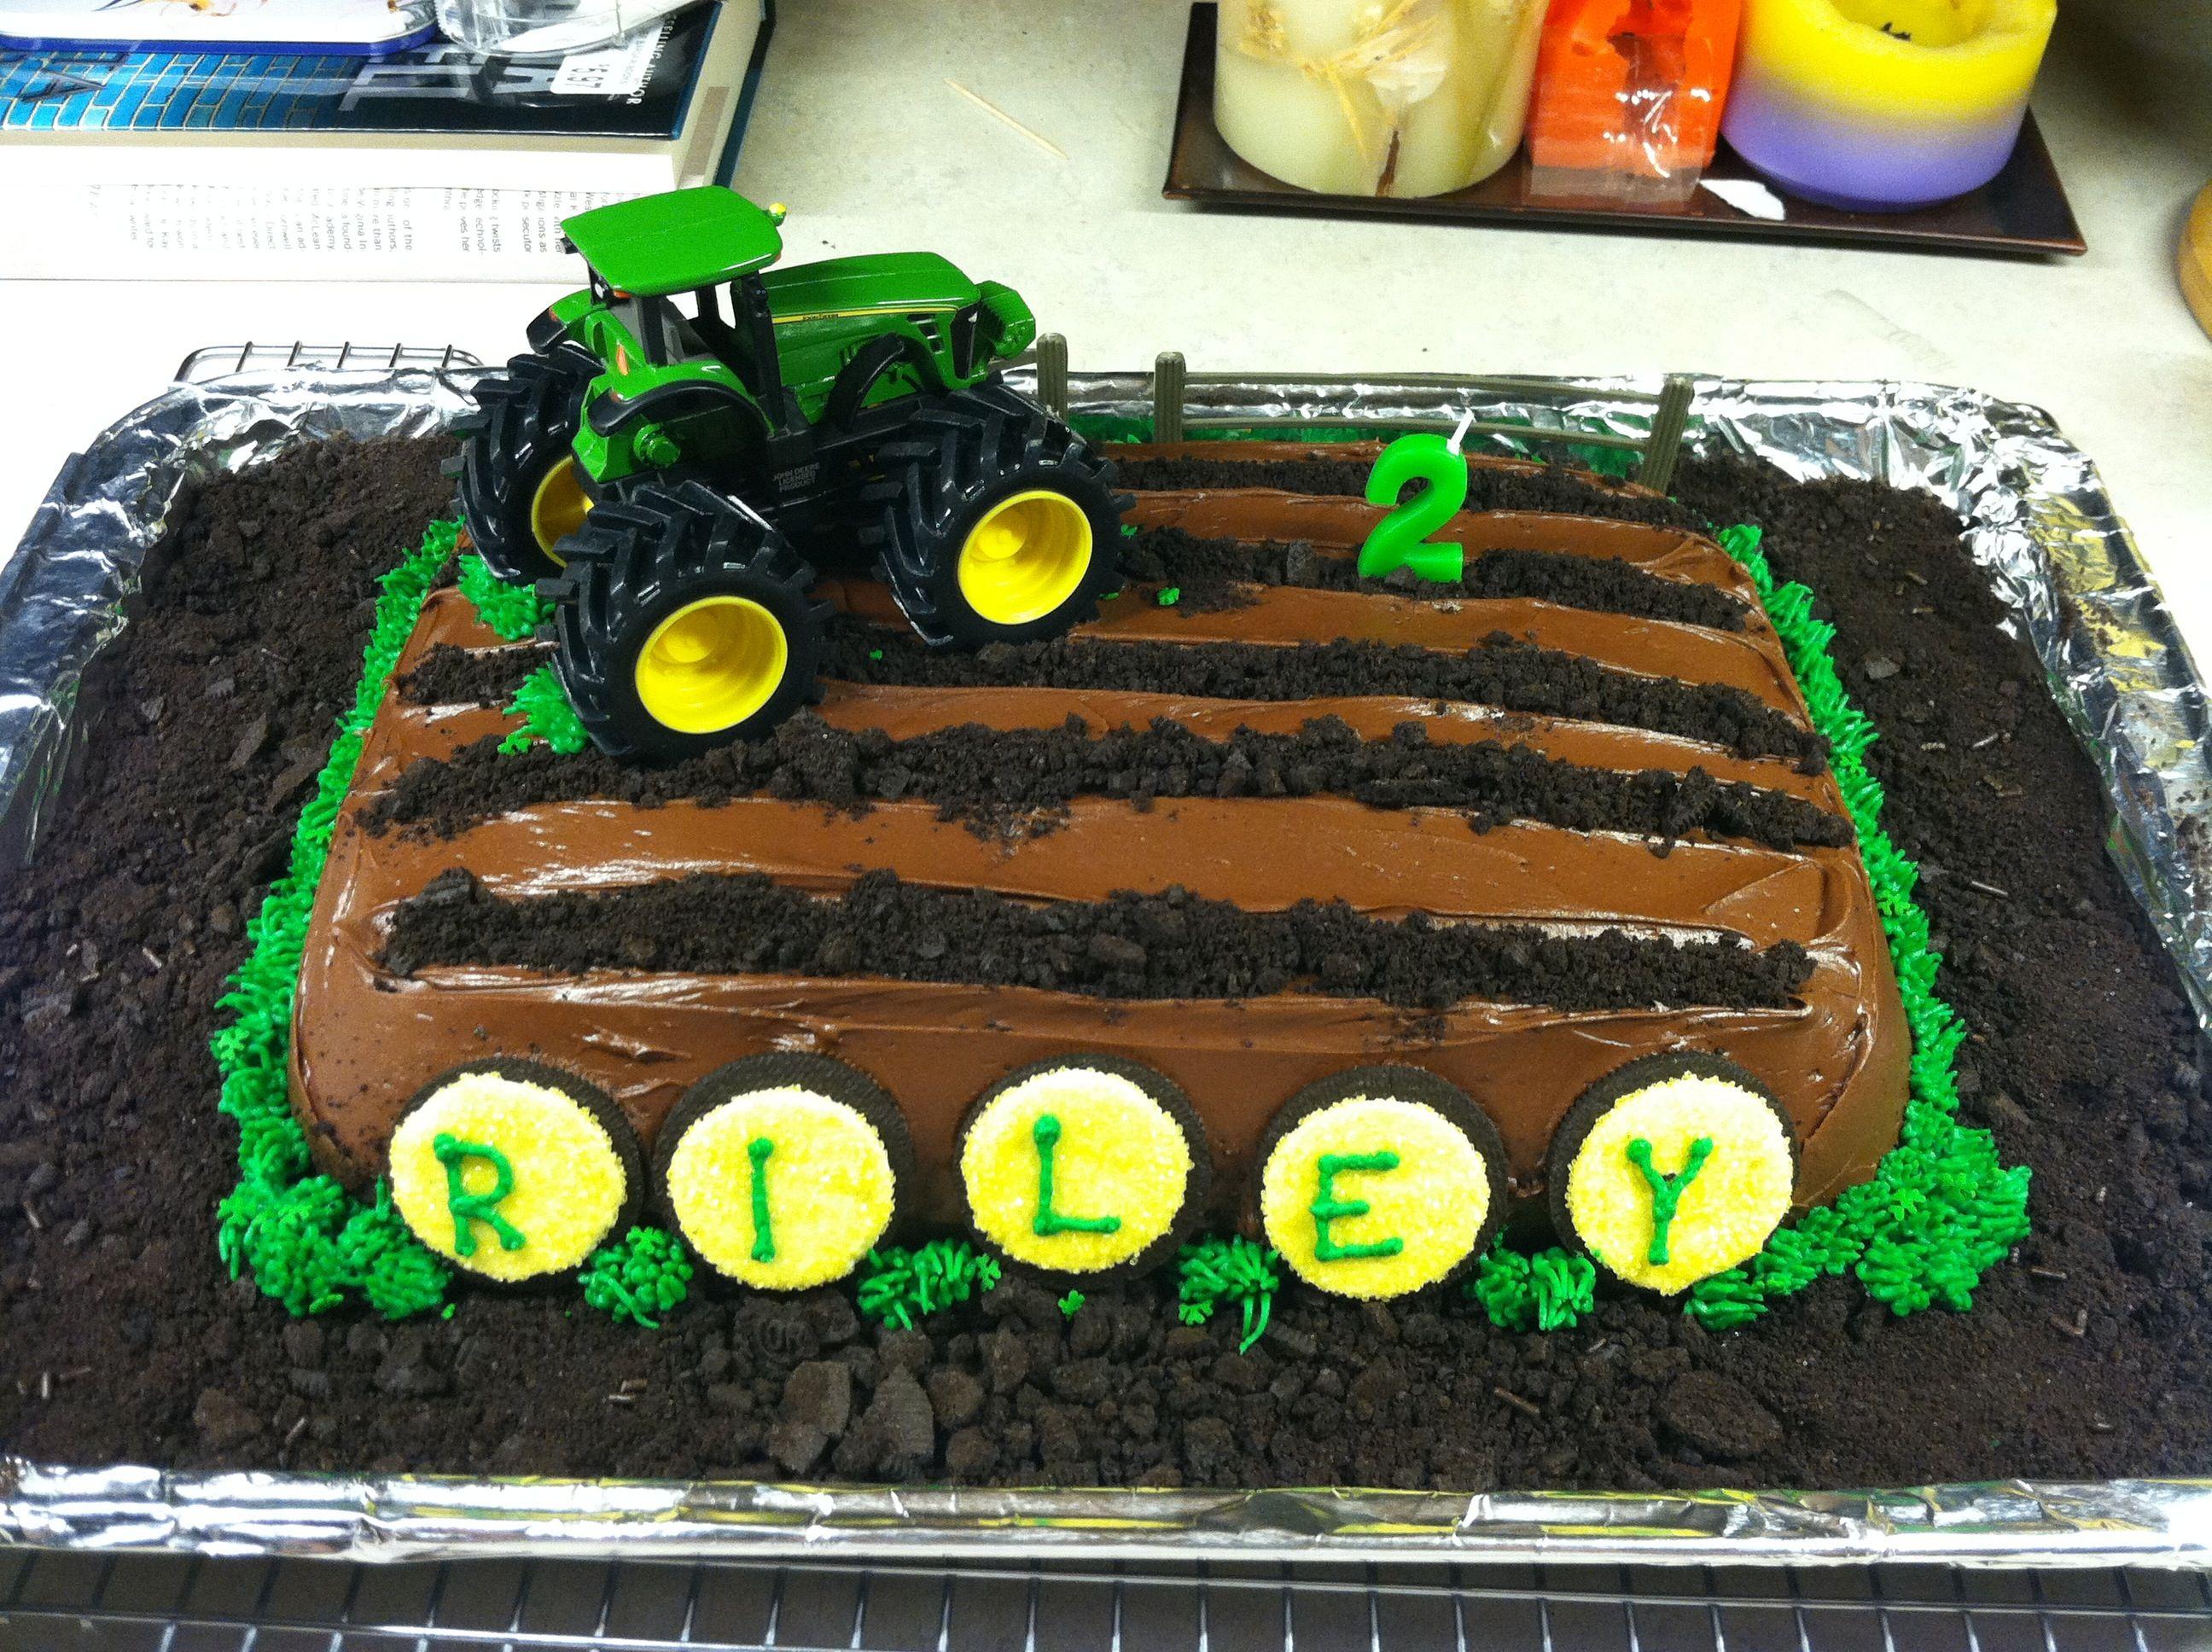 John Deere Tractor Cake White cake with chocolate fudge icing and